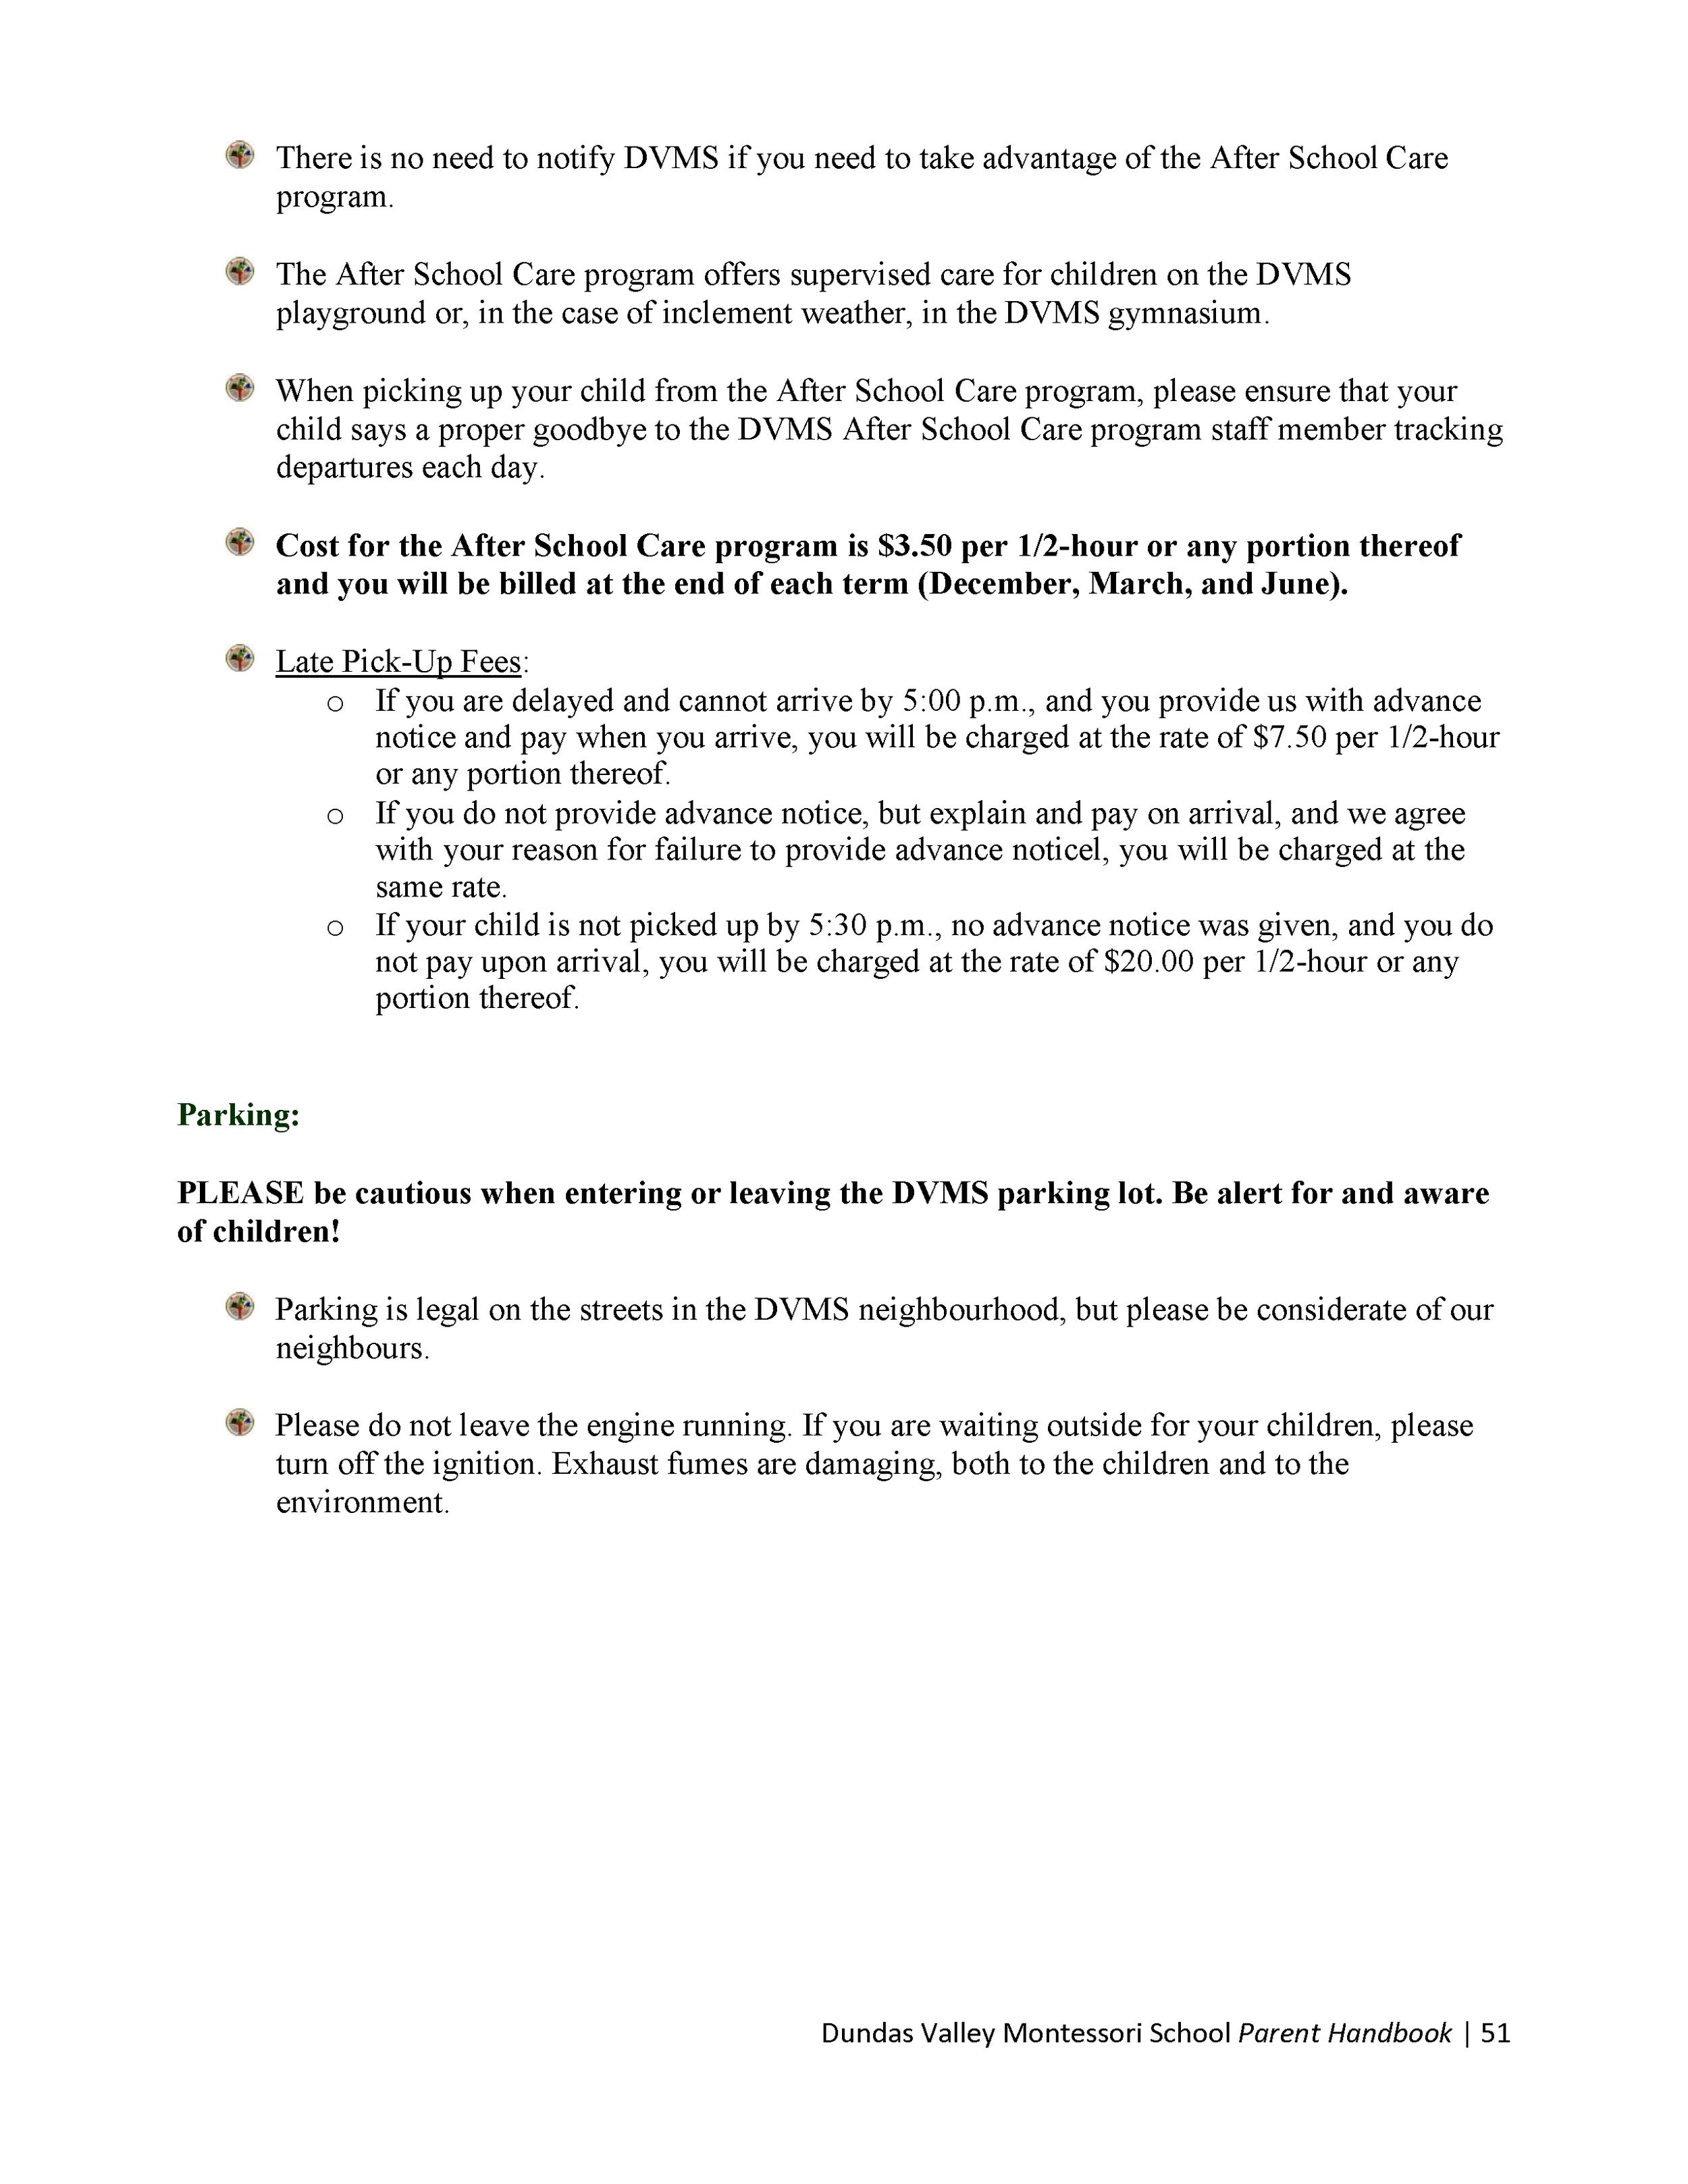 DVMS-Parent-Handbook-19-20_Page_053.png